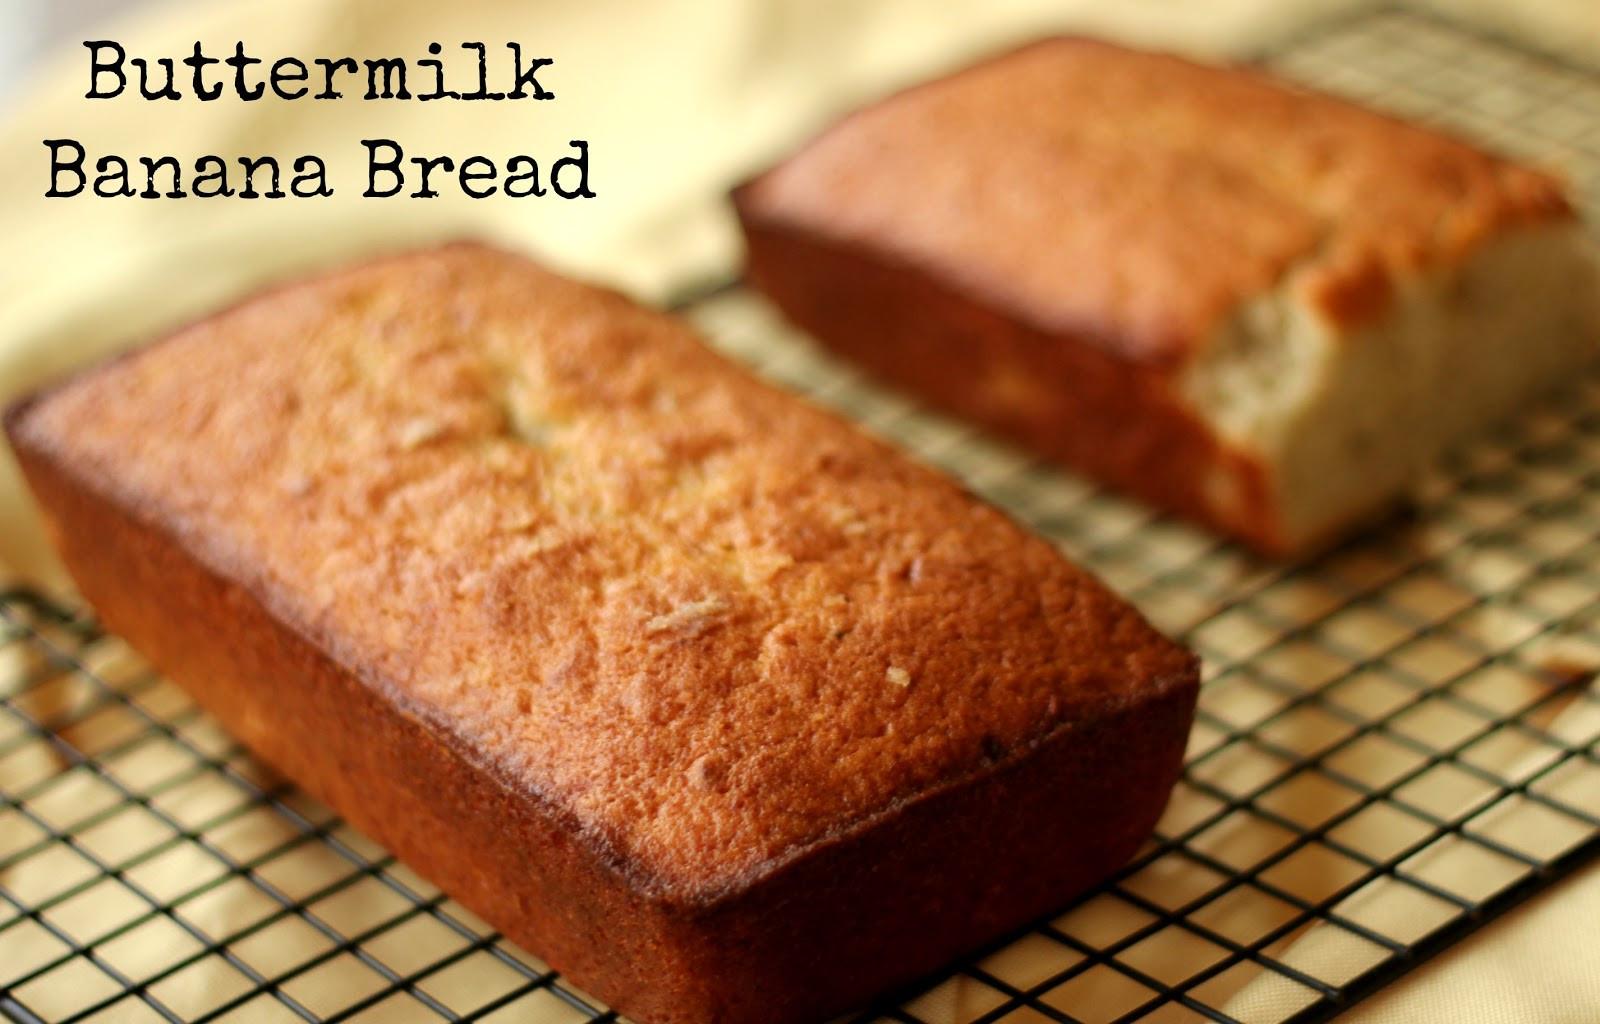 Buttermilk Bread Recipe  The Unsophisticated Kitchen Buttermilk Banana Bread The